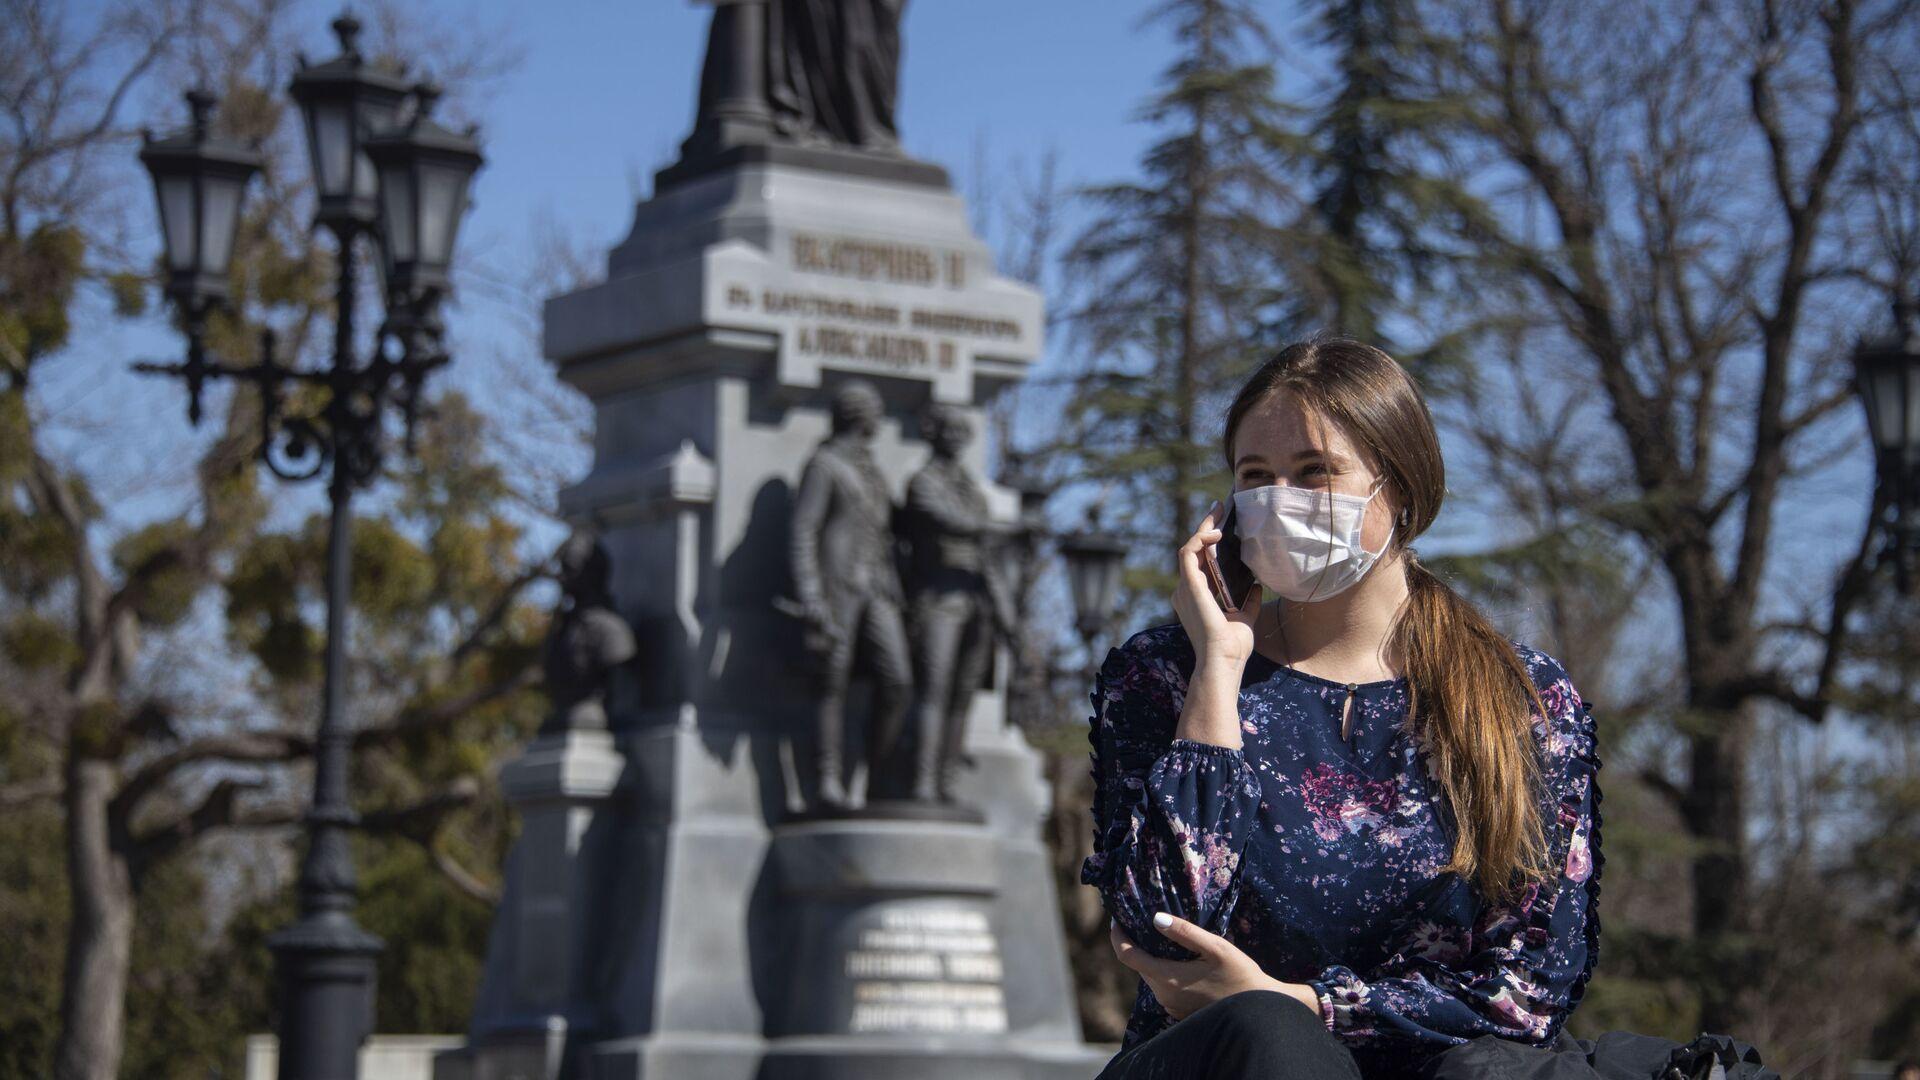 Симферополь вирус коронавирус маска весна - РИА Новости, 1920, 18.05.2020